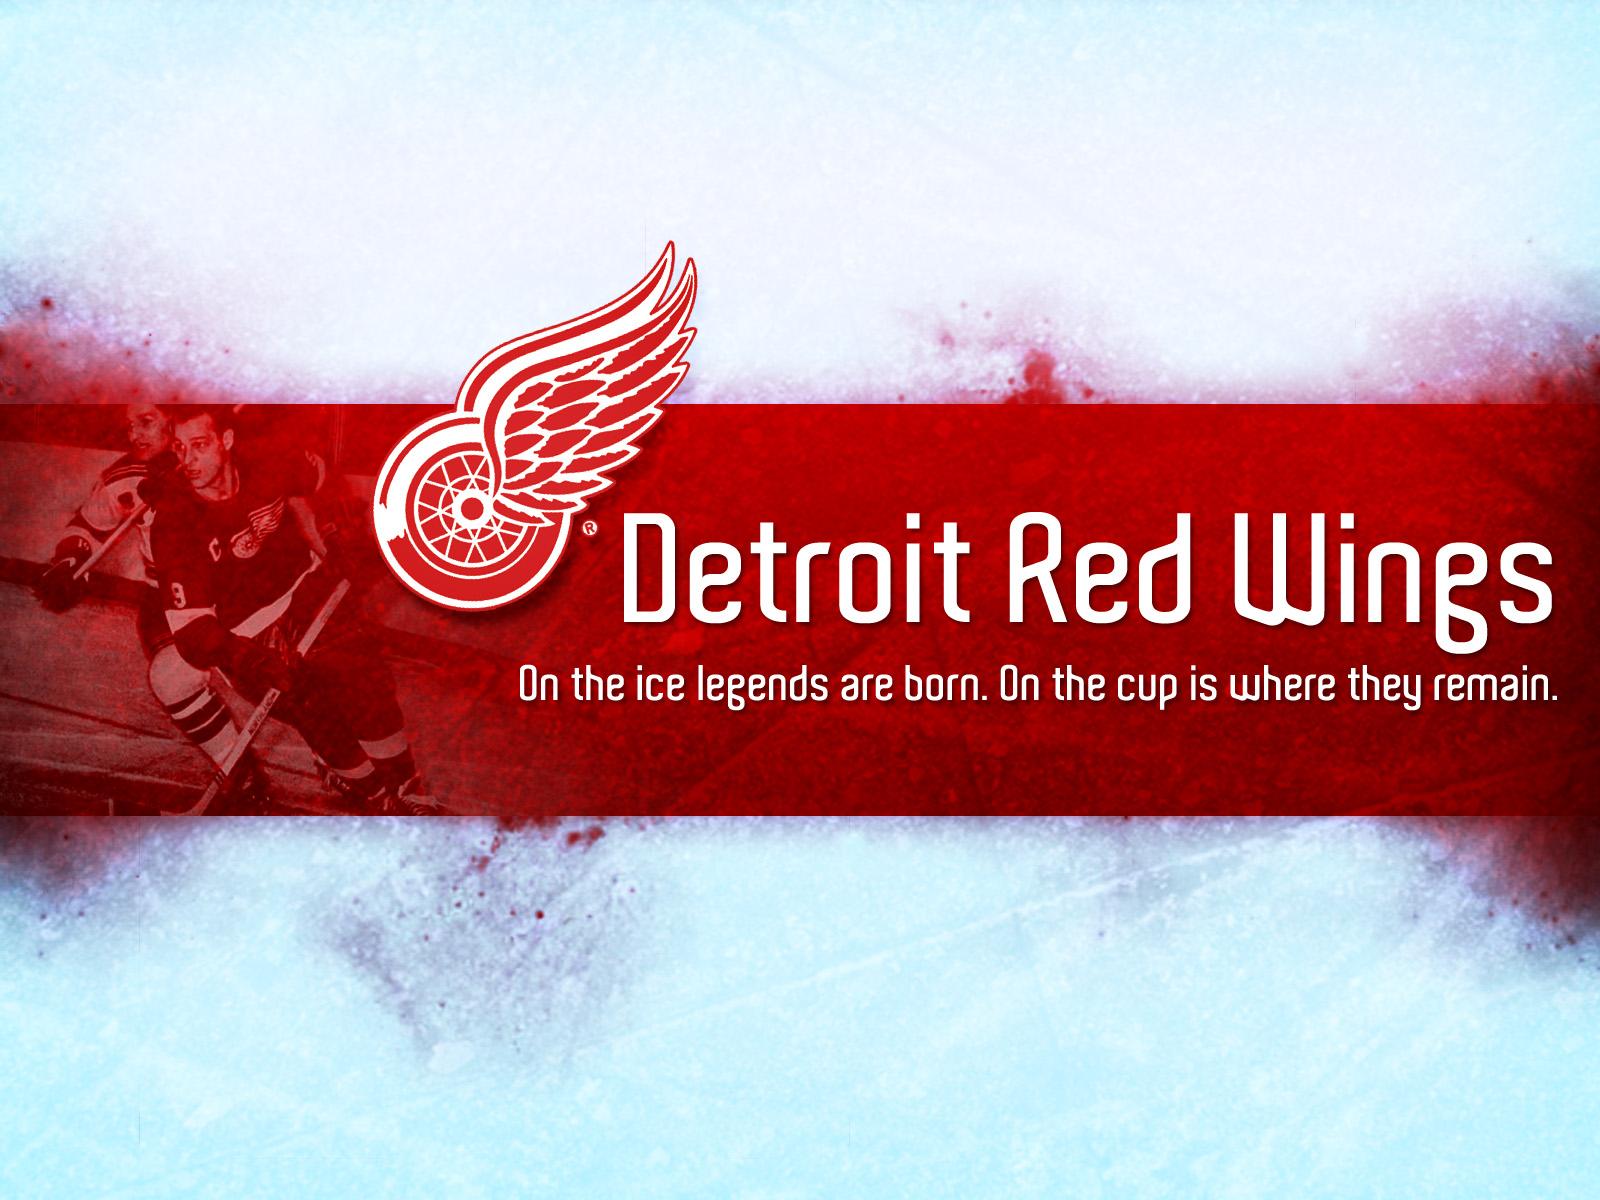 red wings logo wallpaper 1600x1200